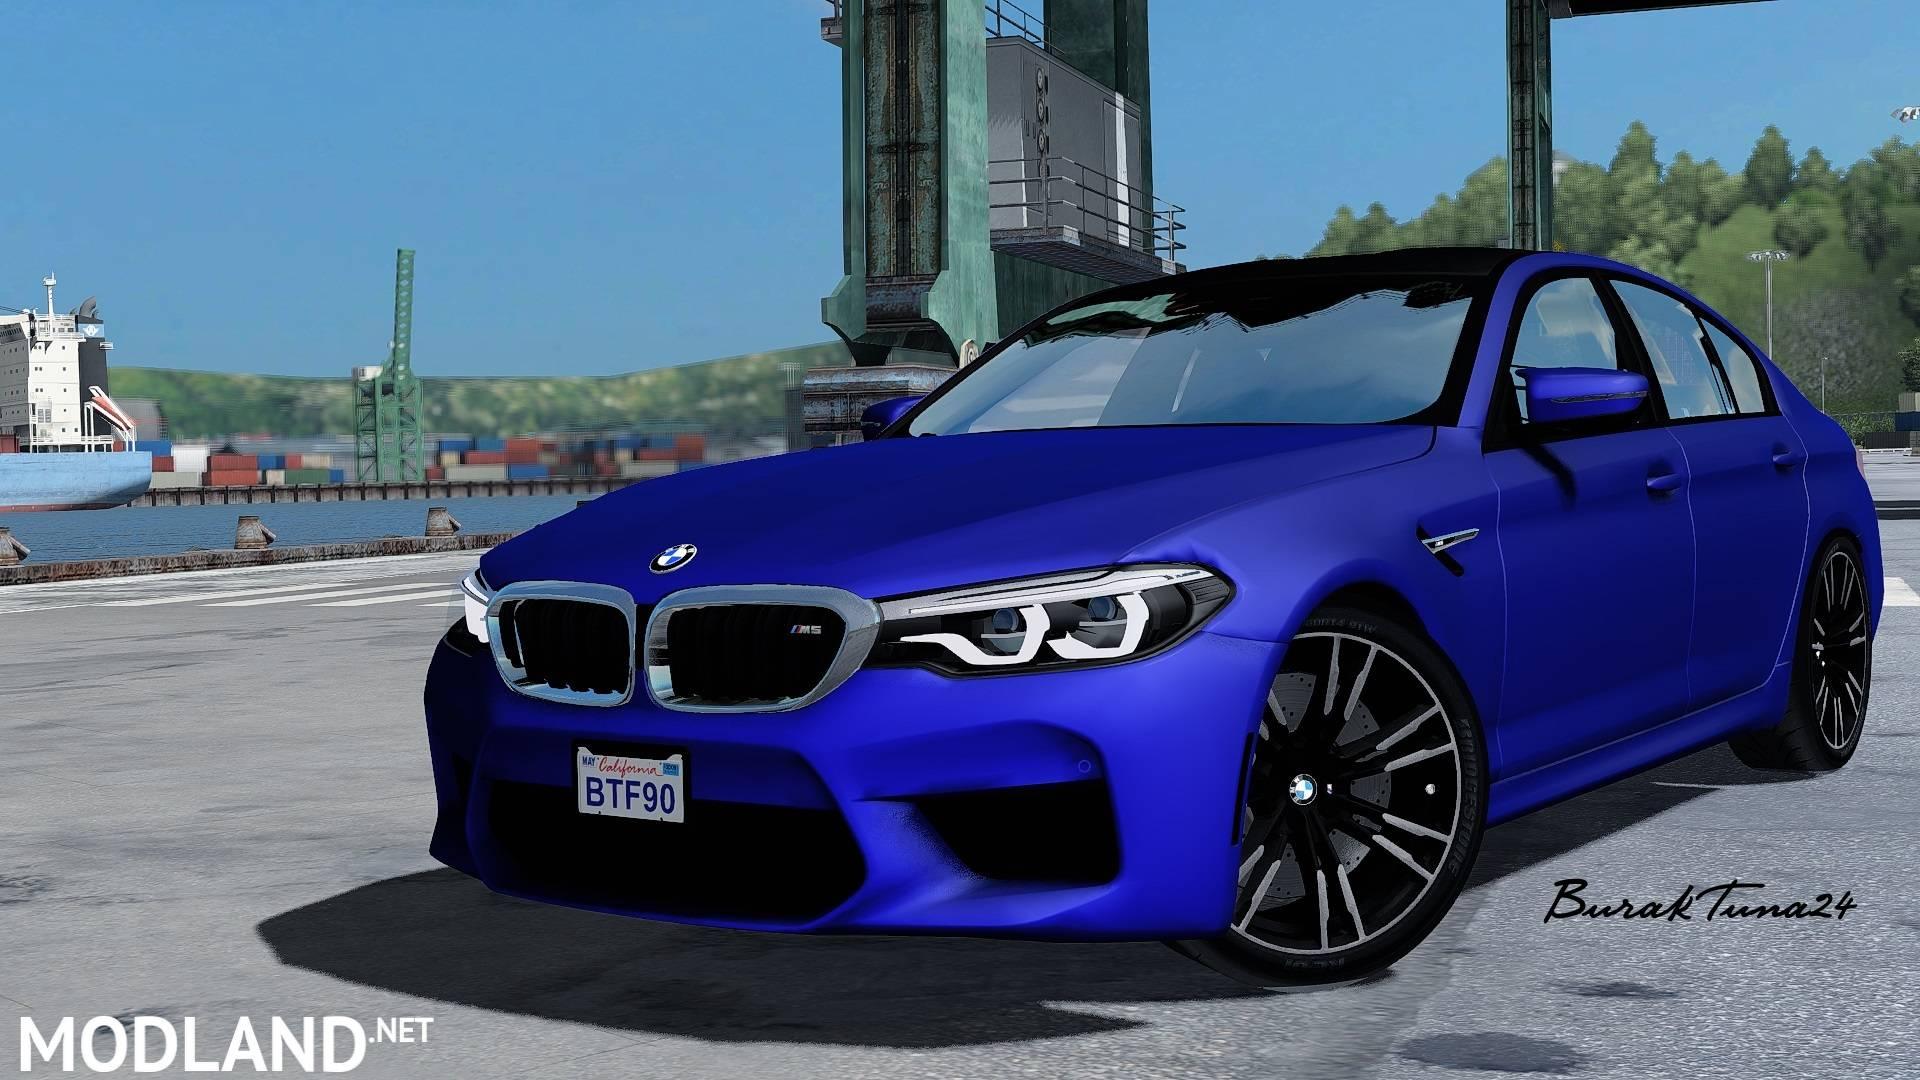 BMW M5 F90 by BurakTuna24 4 photo